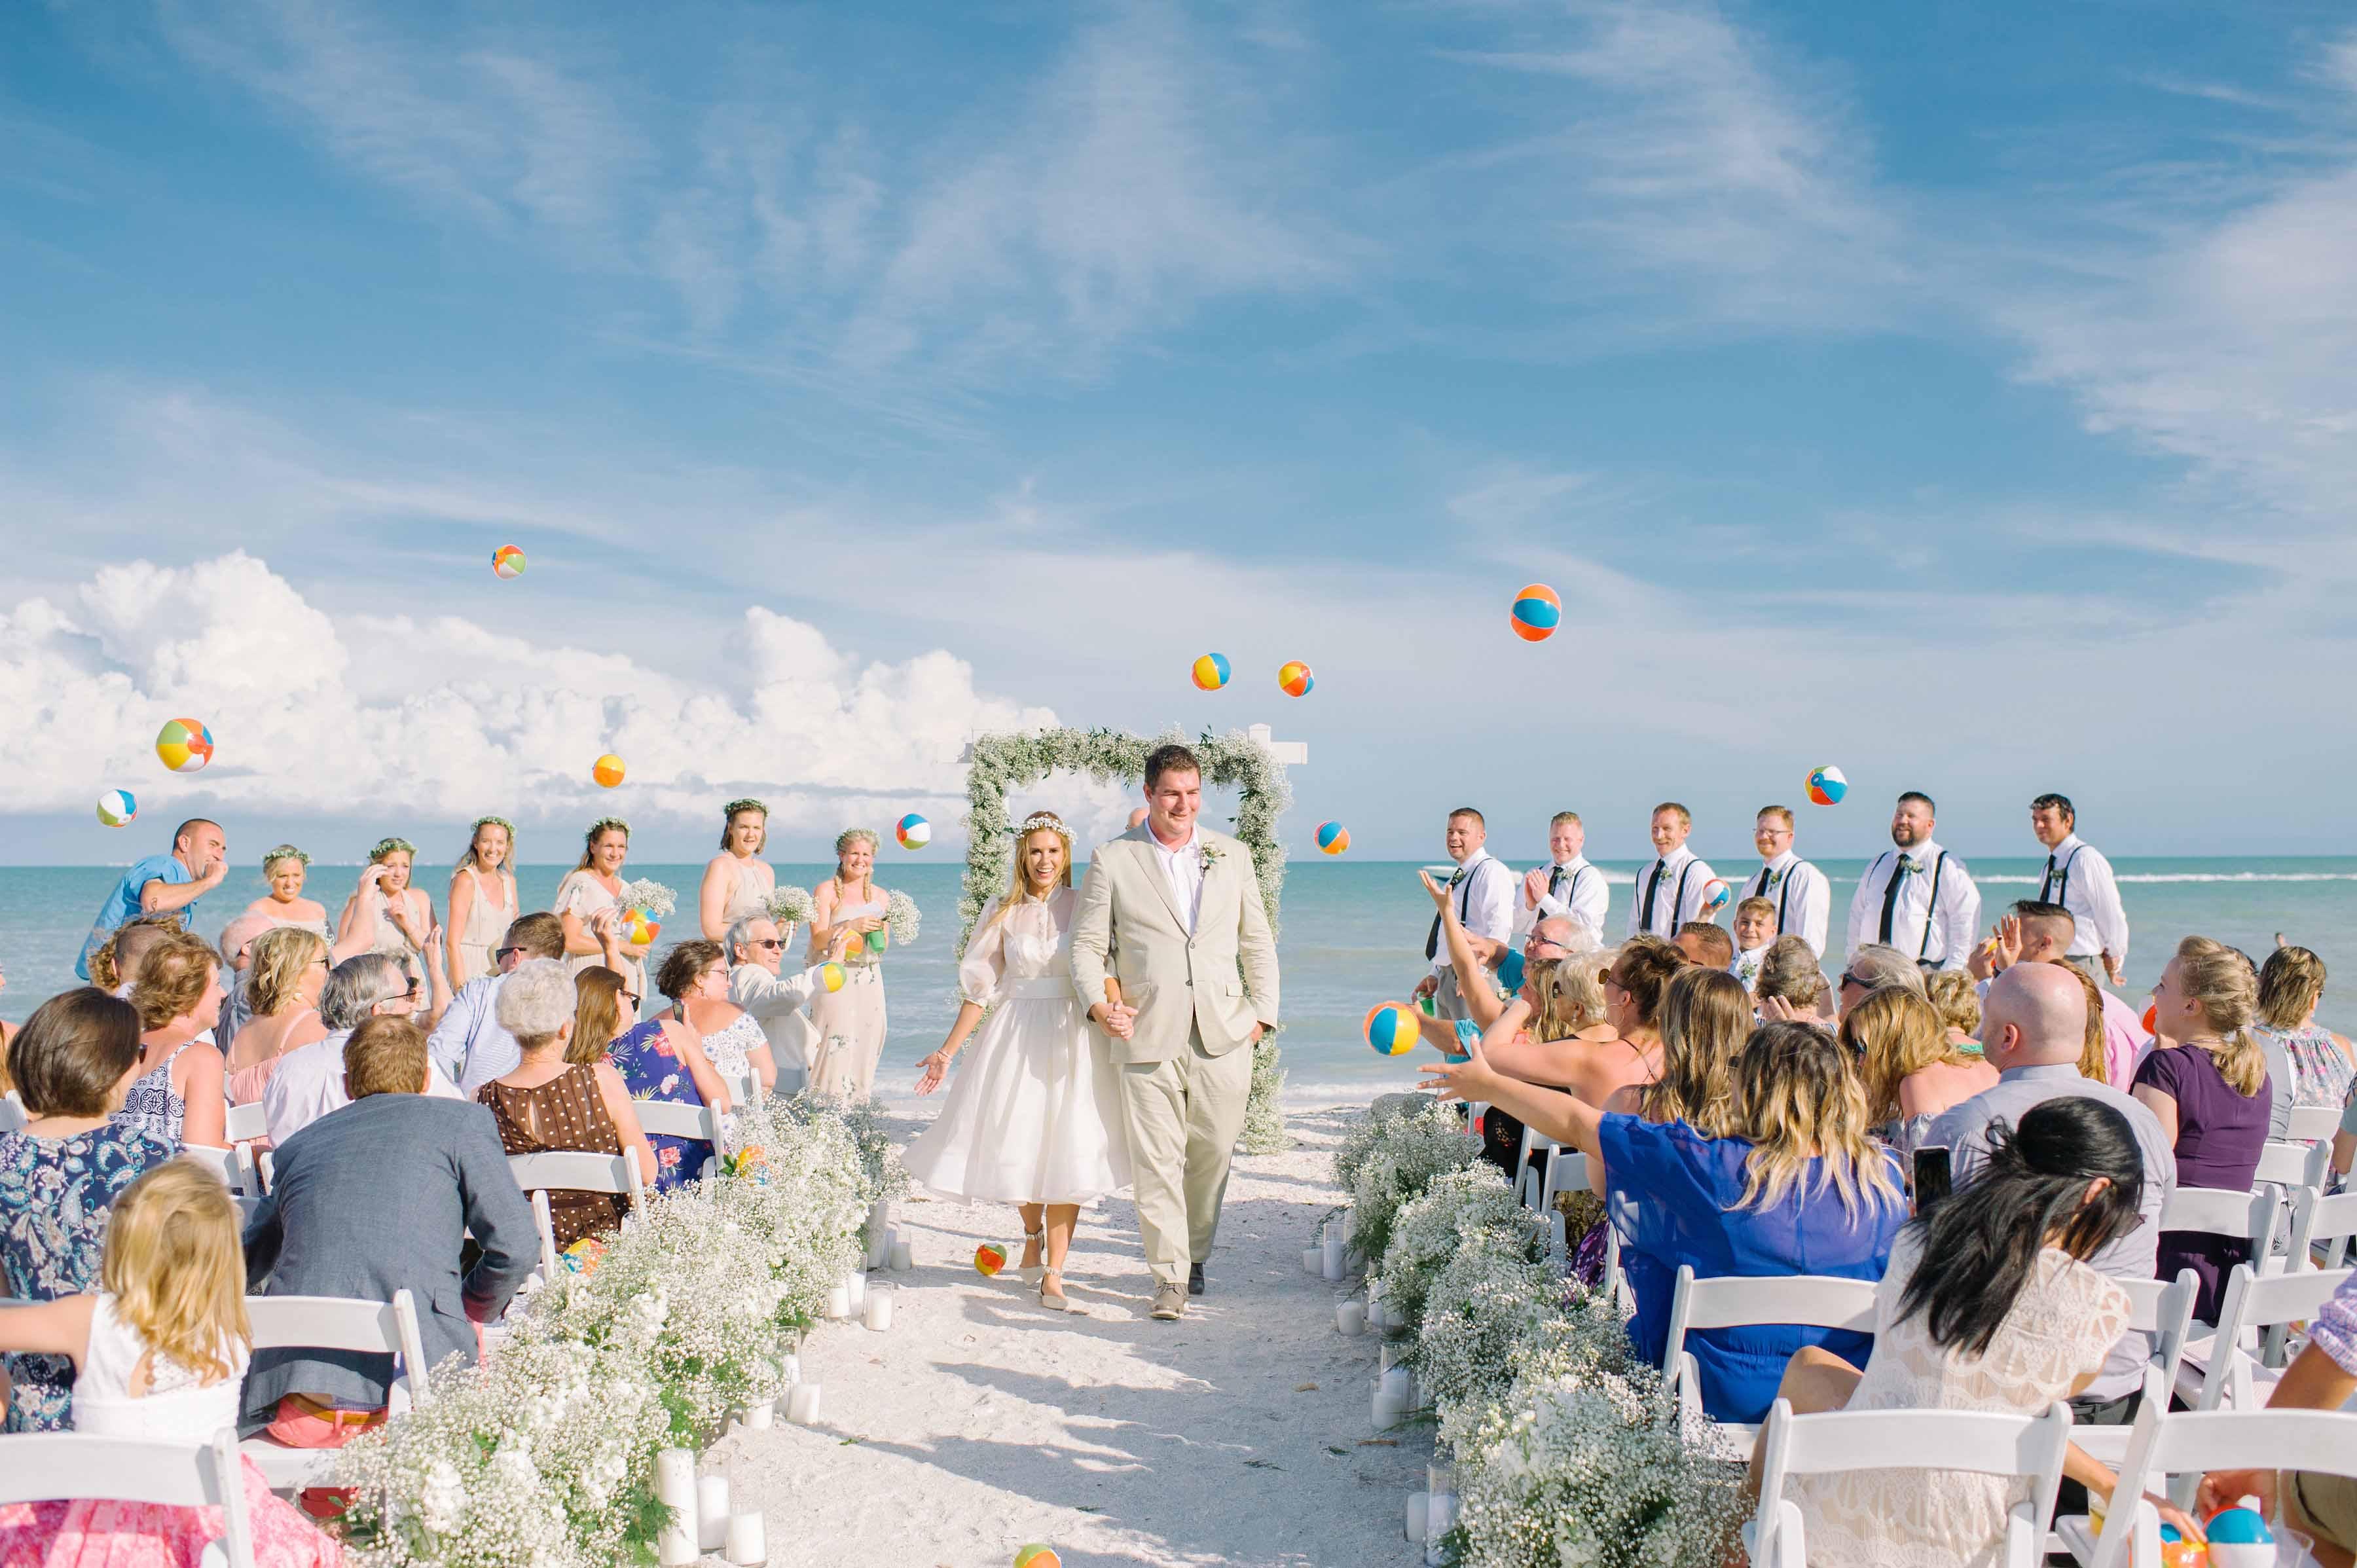 Ð?аÑ?Ñ?инки по запÑ?оÑ?Ñ? beach wedding